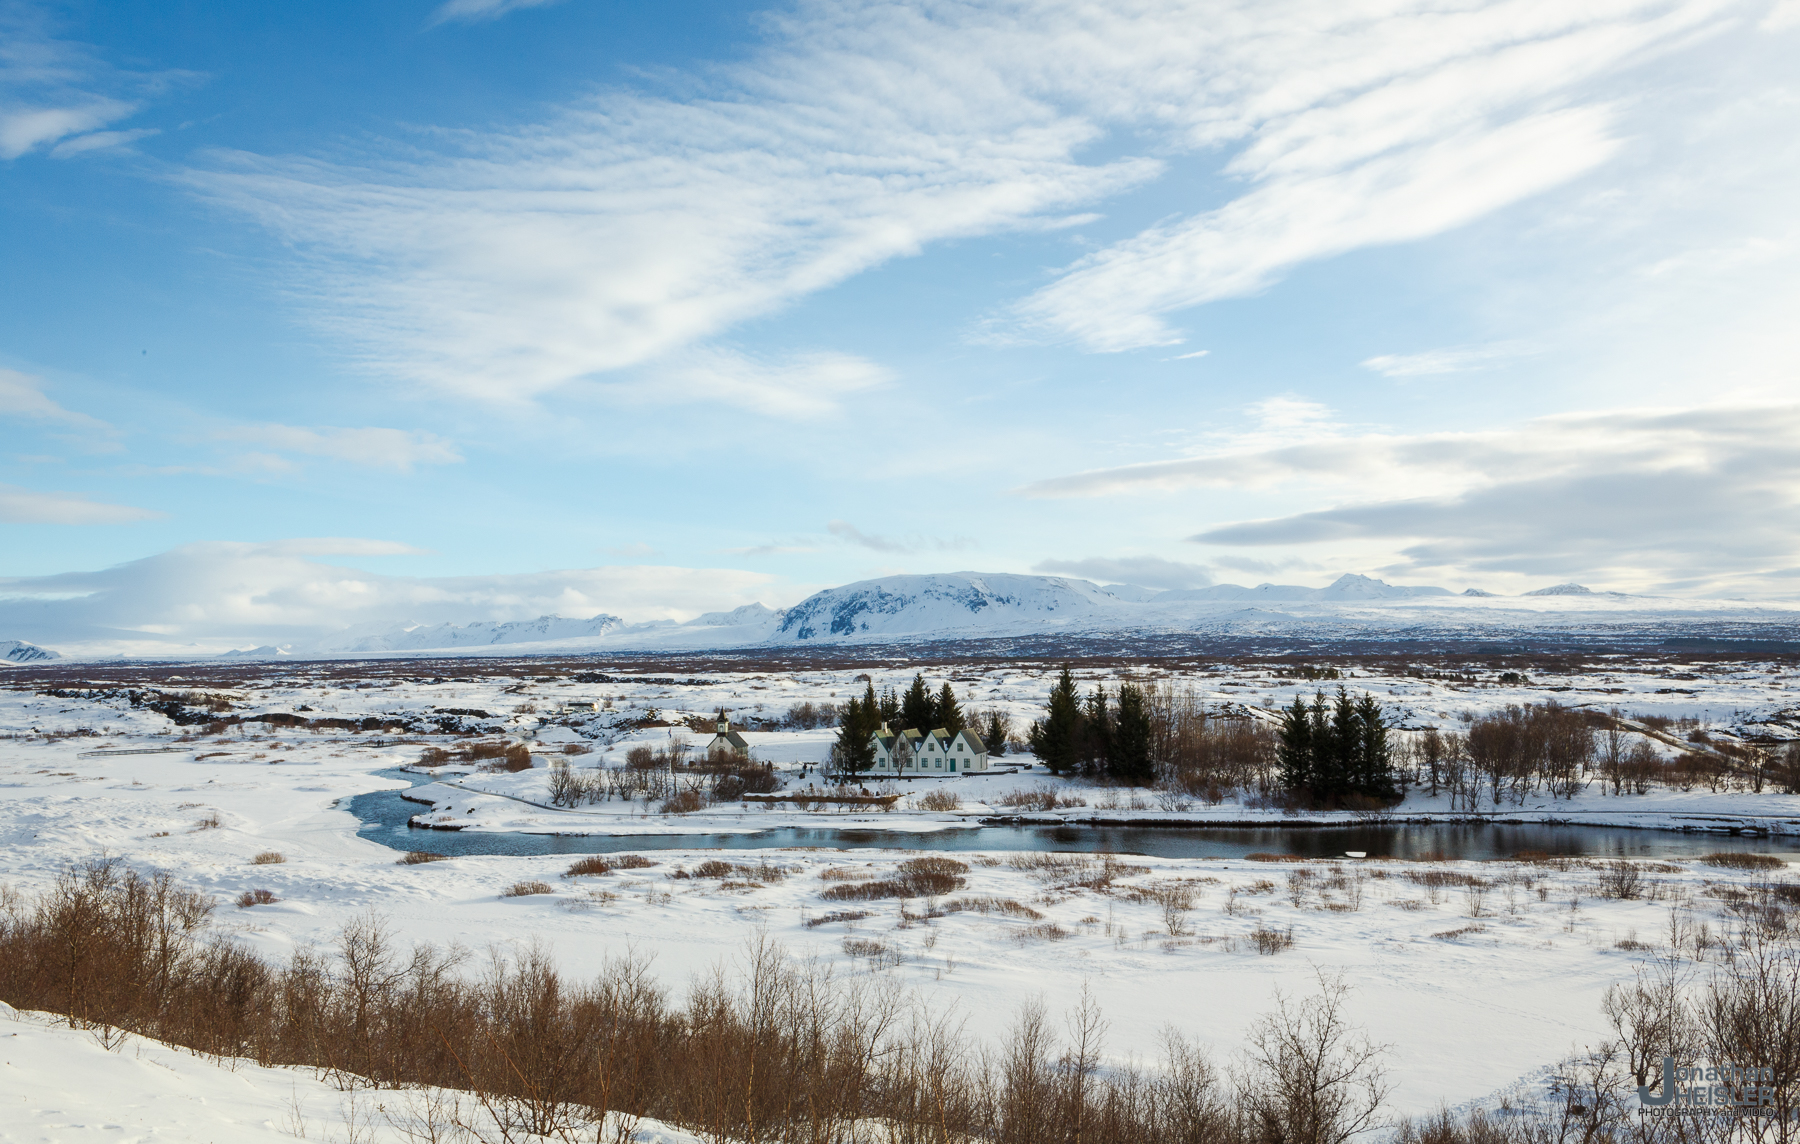 Iceland Winter Photos_  Jonathan Heisler __  02292016 _ 002.jpg